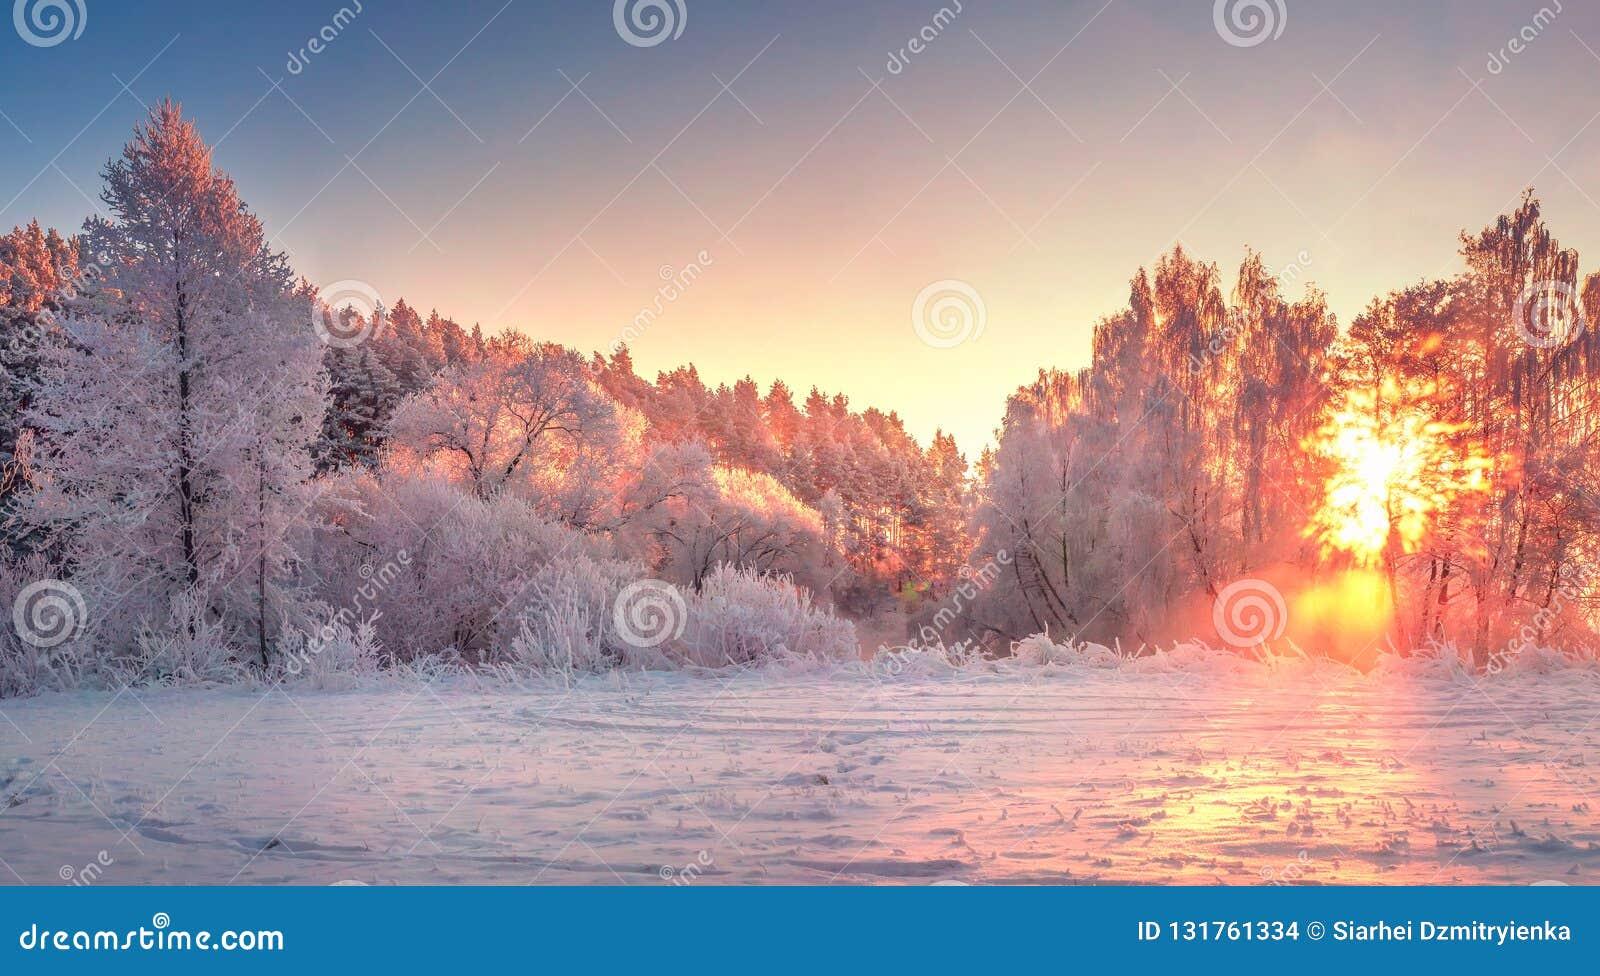 Salida del sol del paisaje de la mañana del invierno